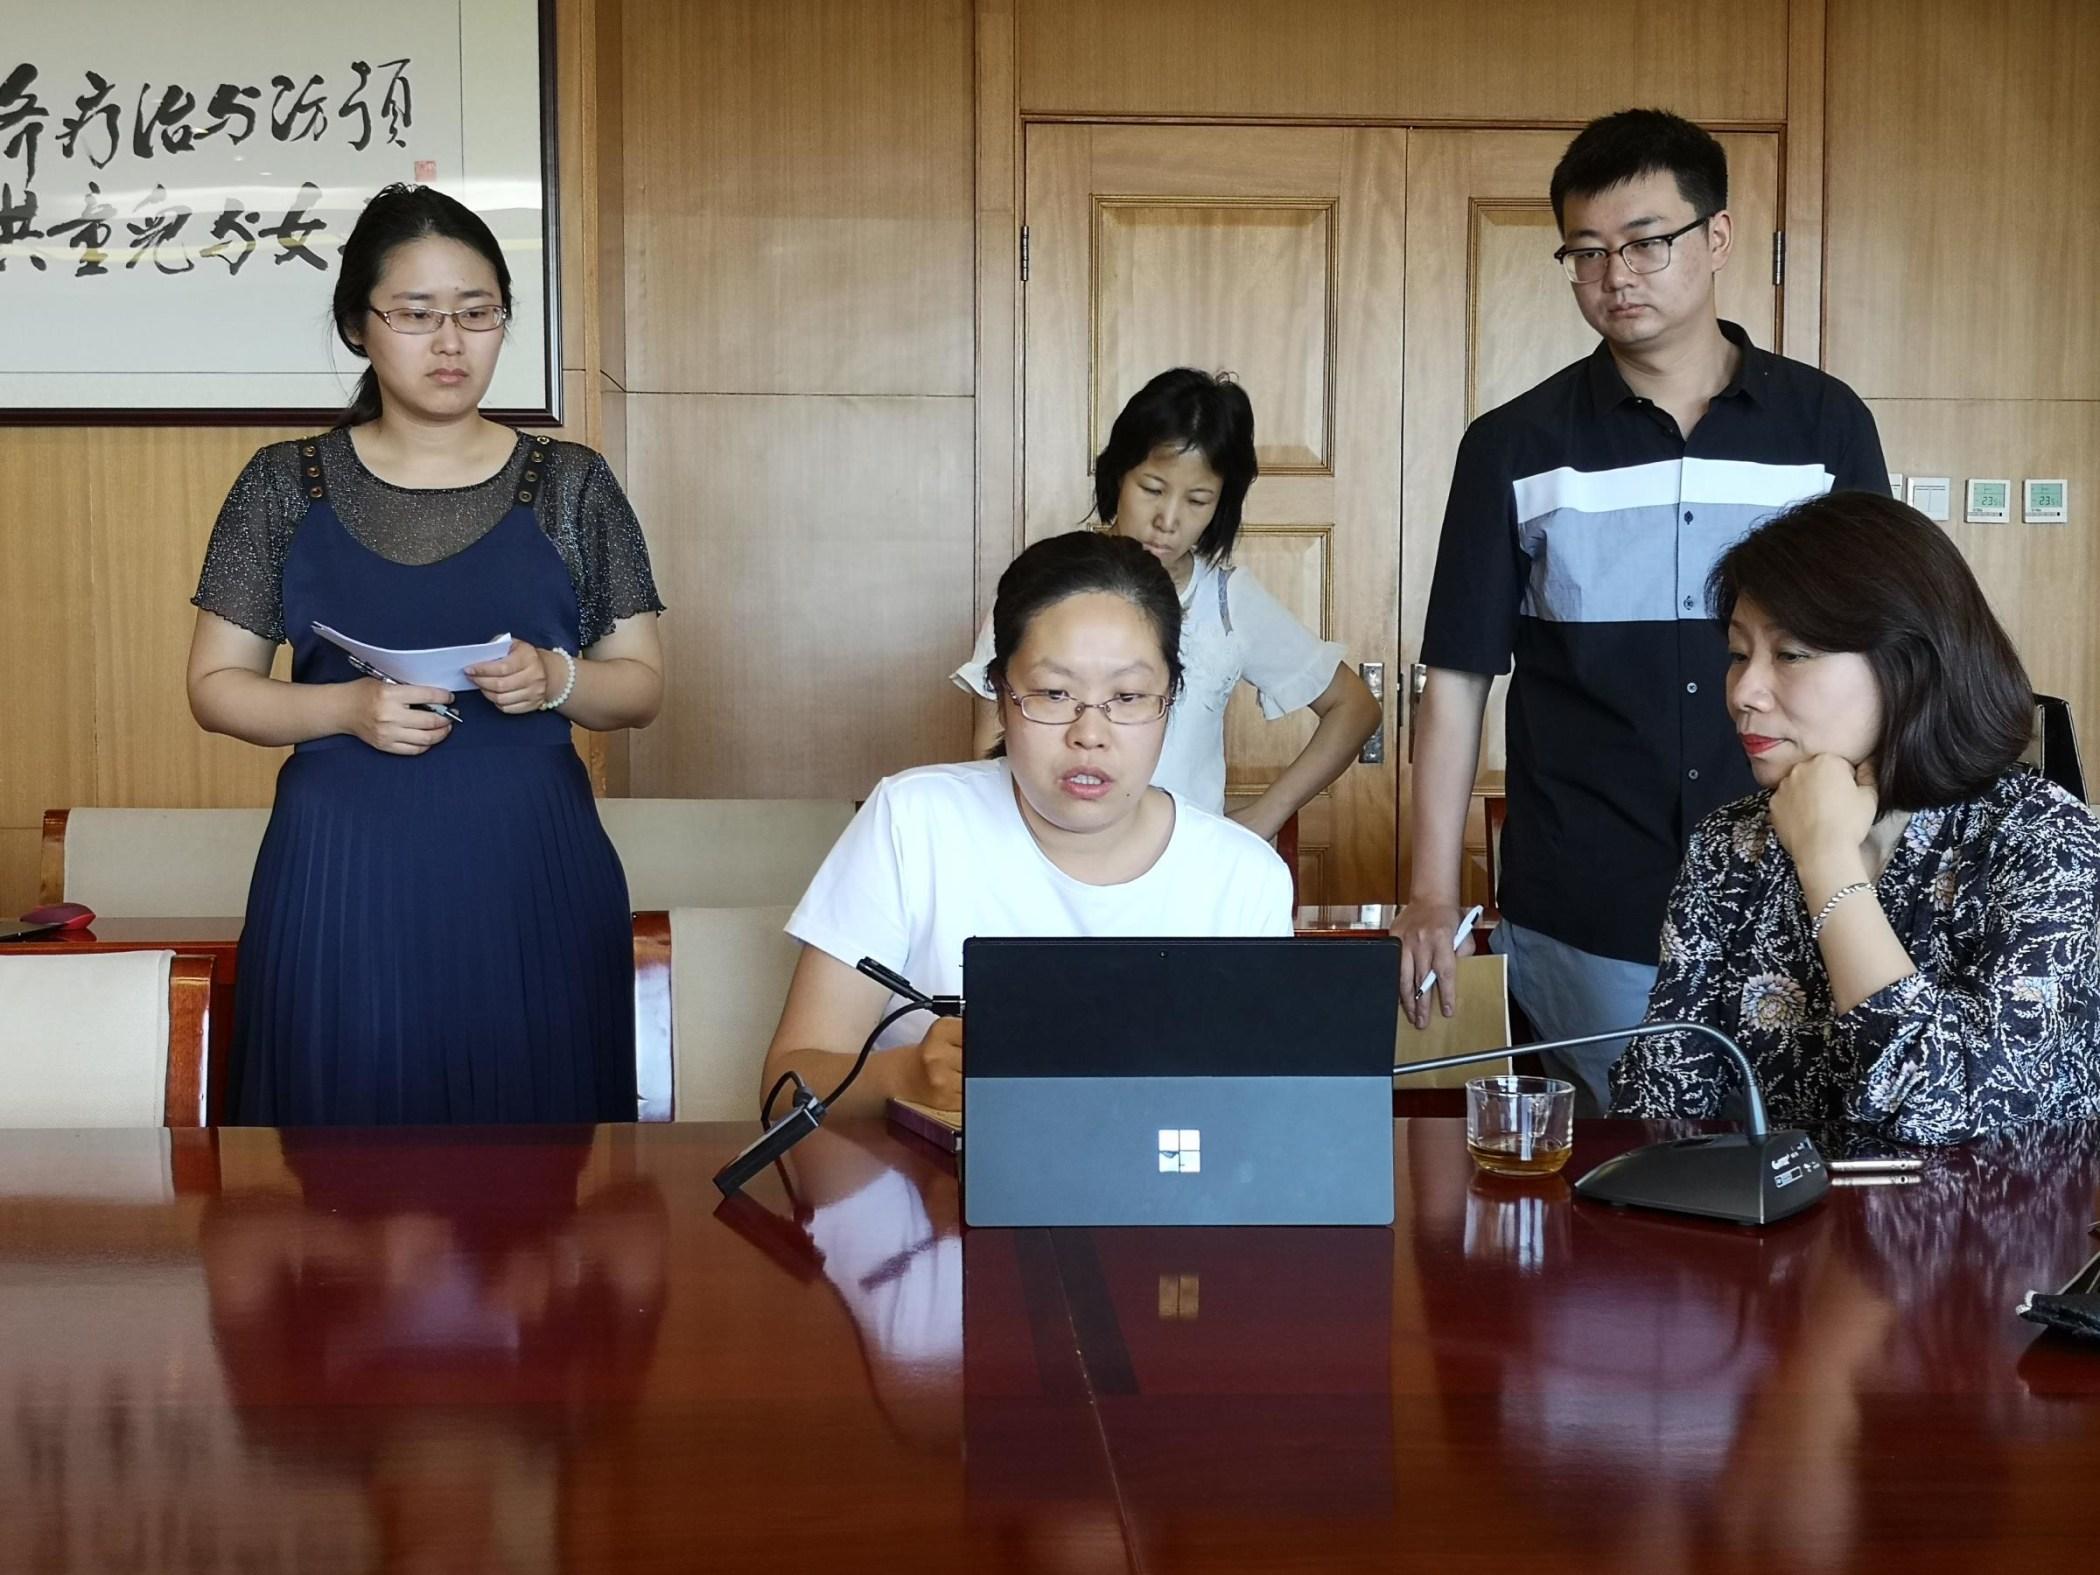 group gathered around a laptop